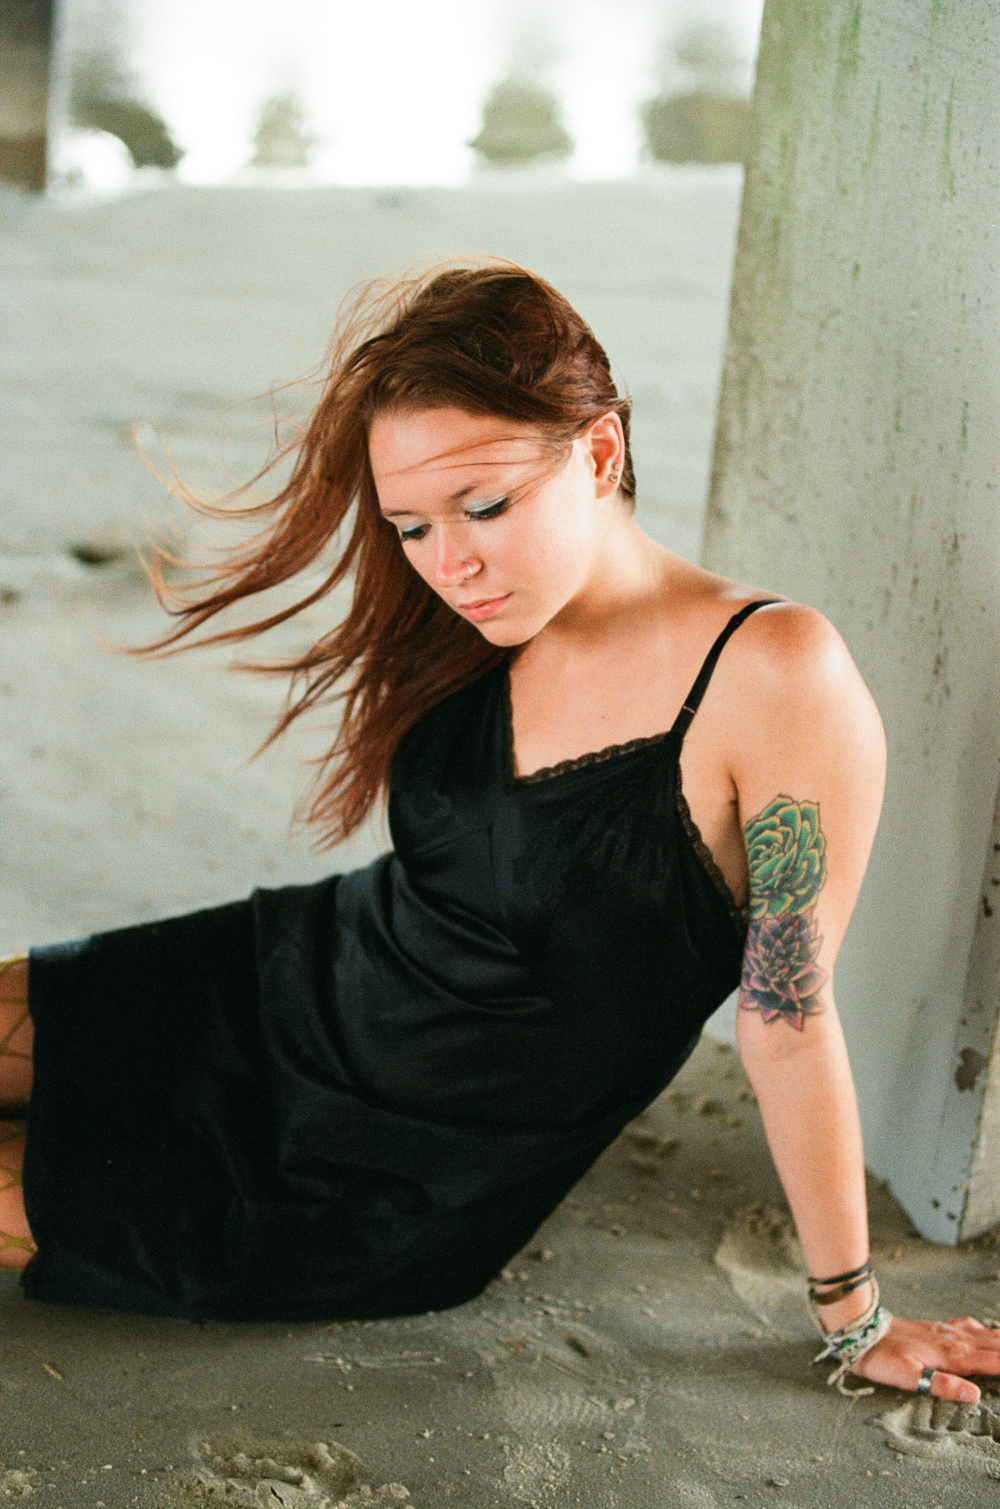 creative-film-photography-mermaidens-portrait-series-by-holly-cromer-06.jpg